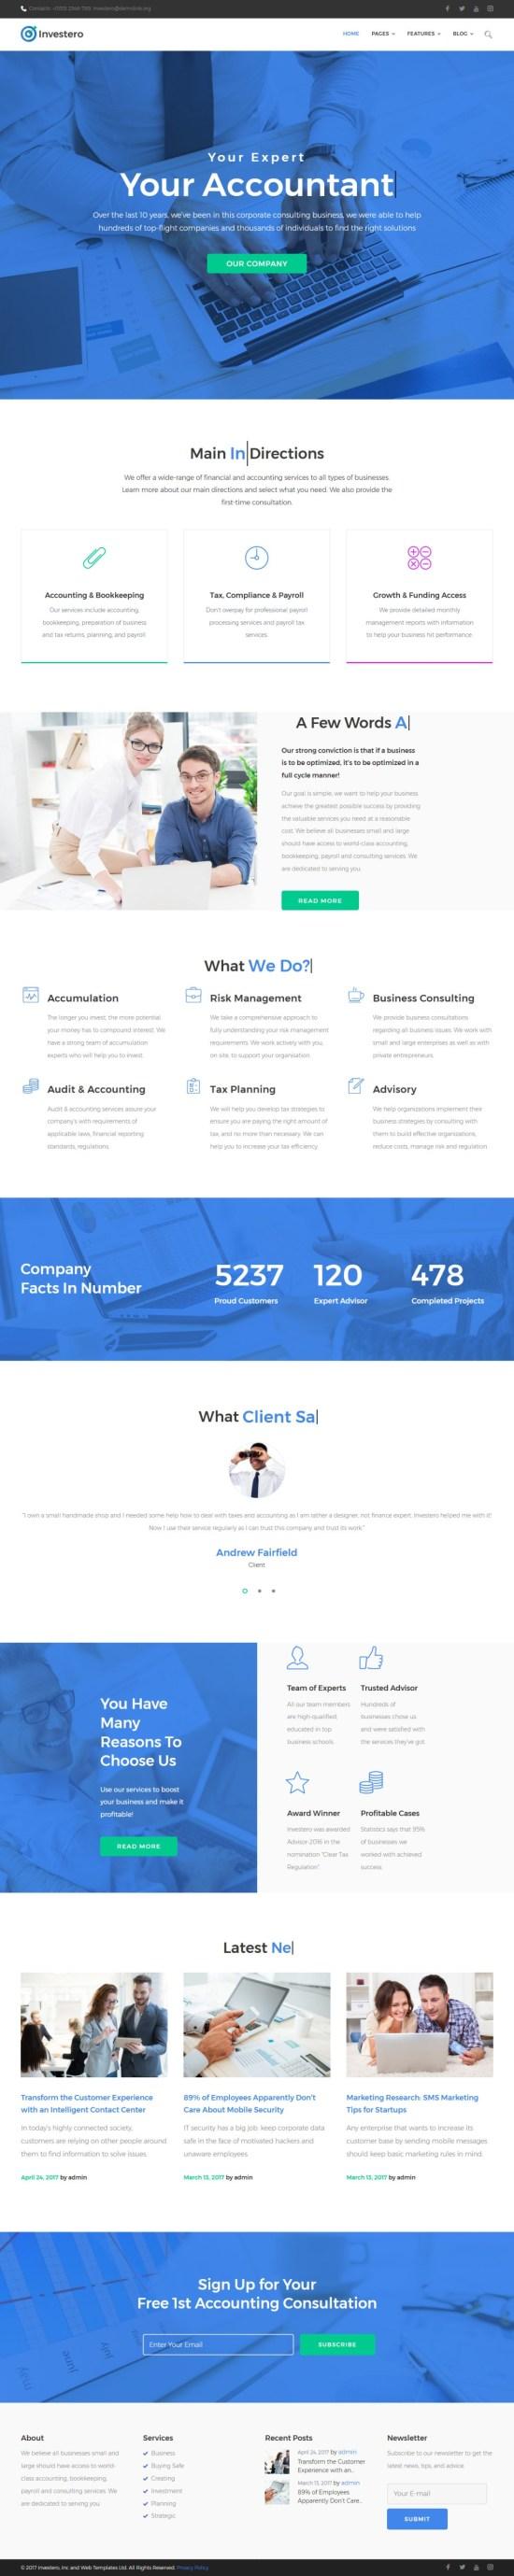 investero wordpress theme 01 - Investero WordPress Theme